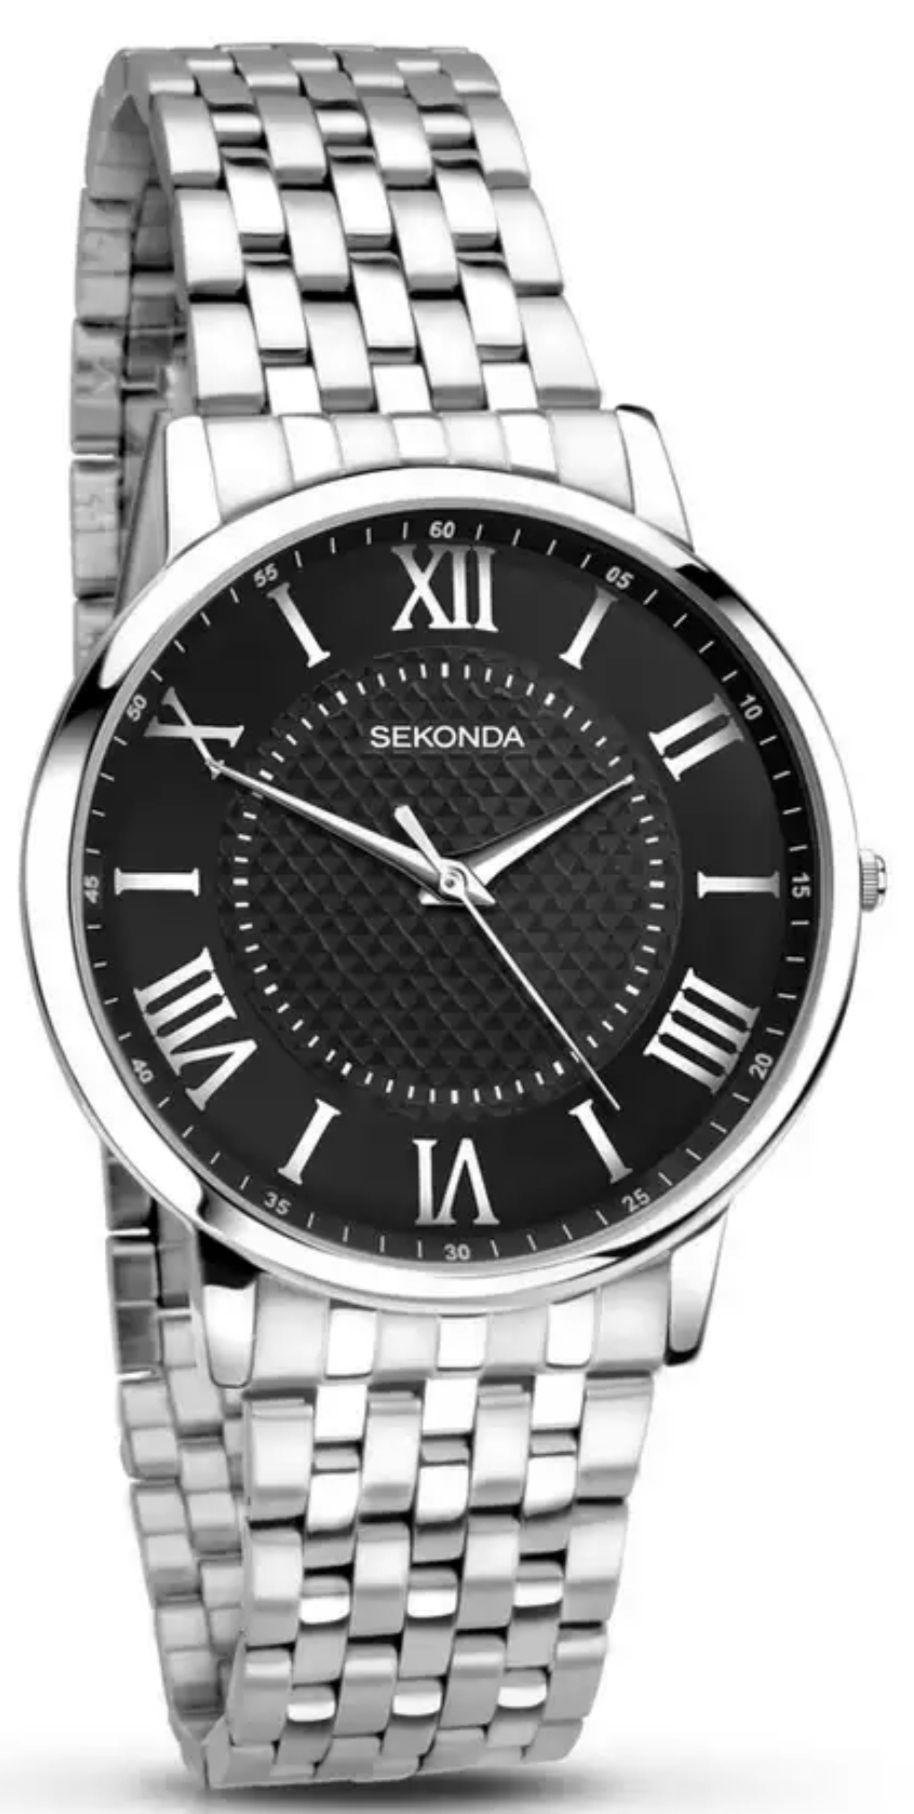 Sekonda-Silver Analogue Bracelet Watch 1332.28 -£18.90 with code delivered @ Debenhams